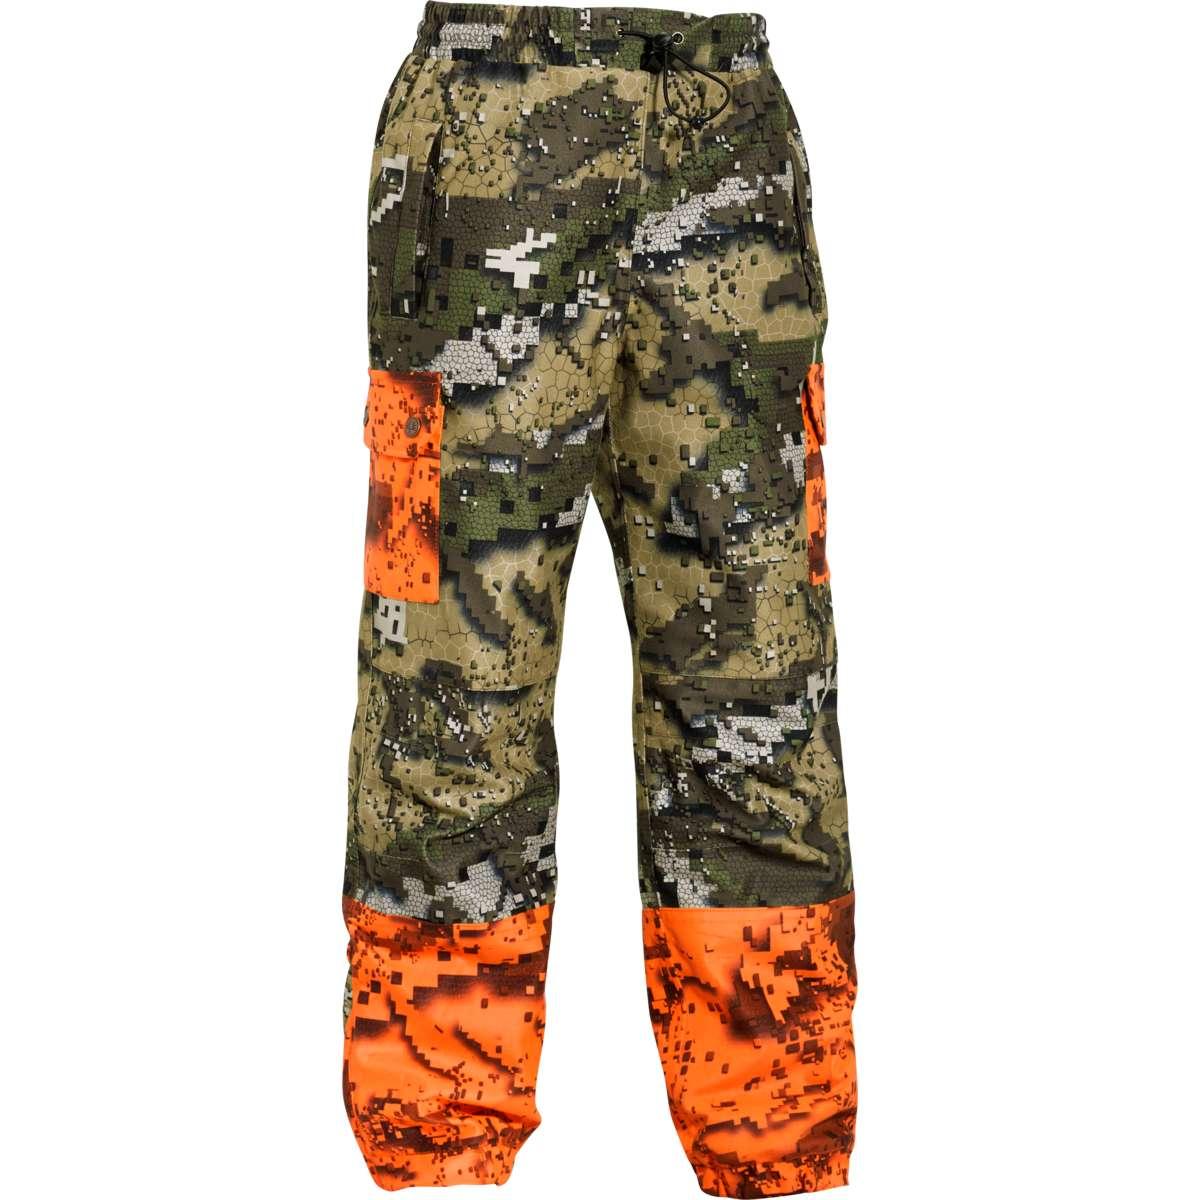 Swedteam Ridge JR Trouser Desolve Fire